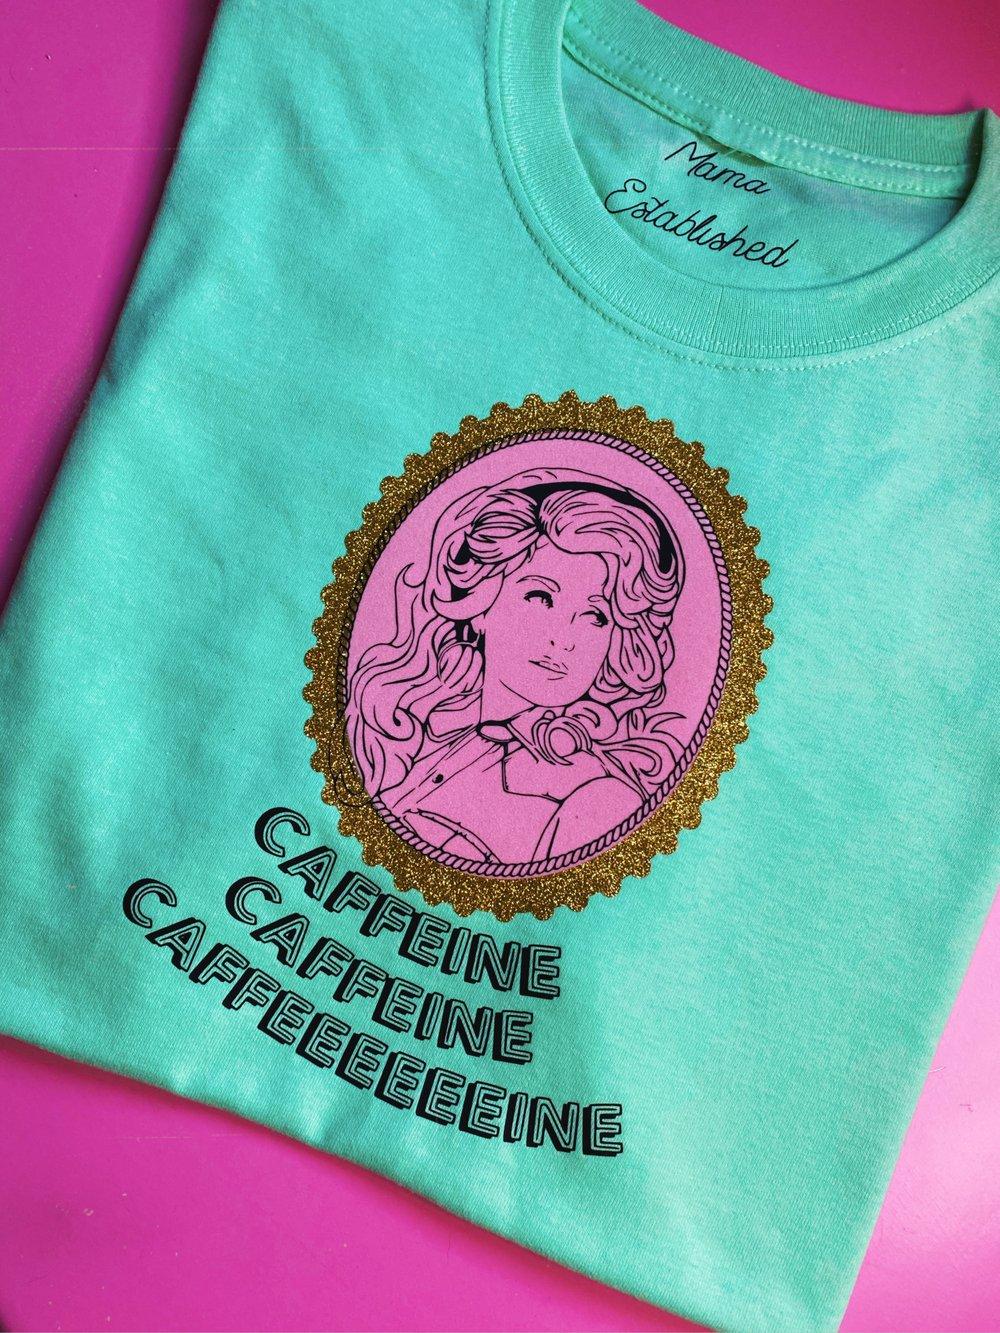 Image of Dolly caffeeeeeeine tee